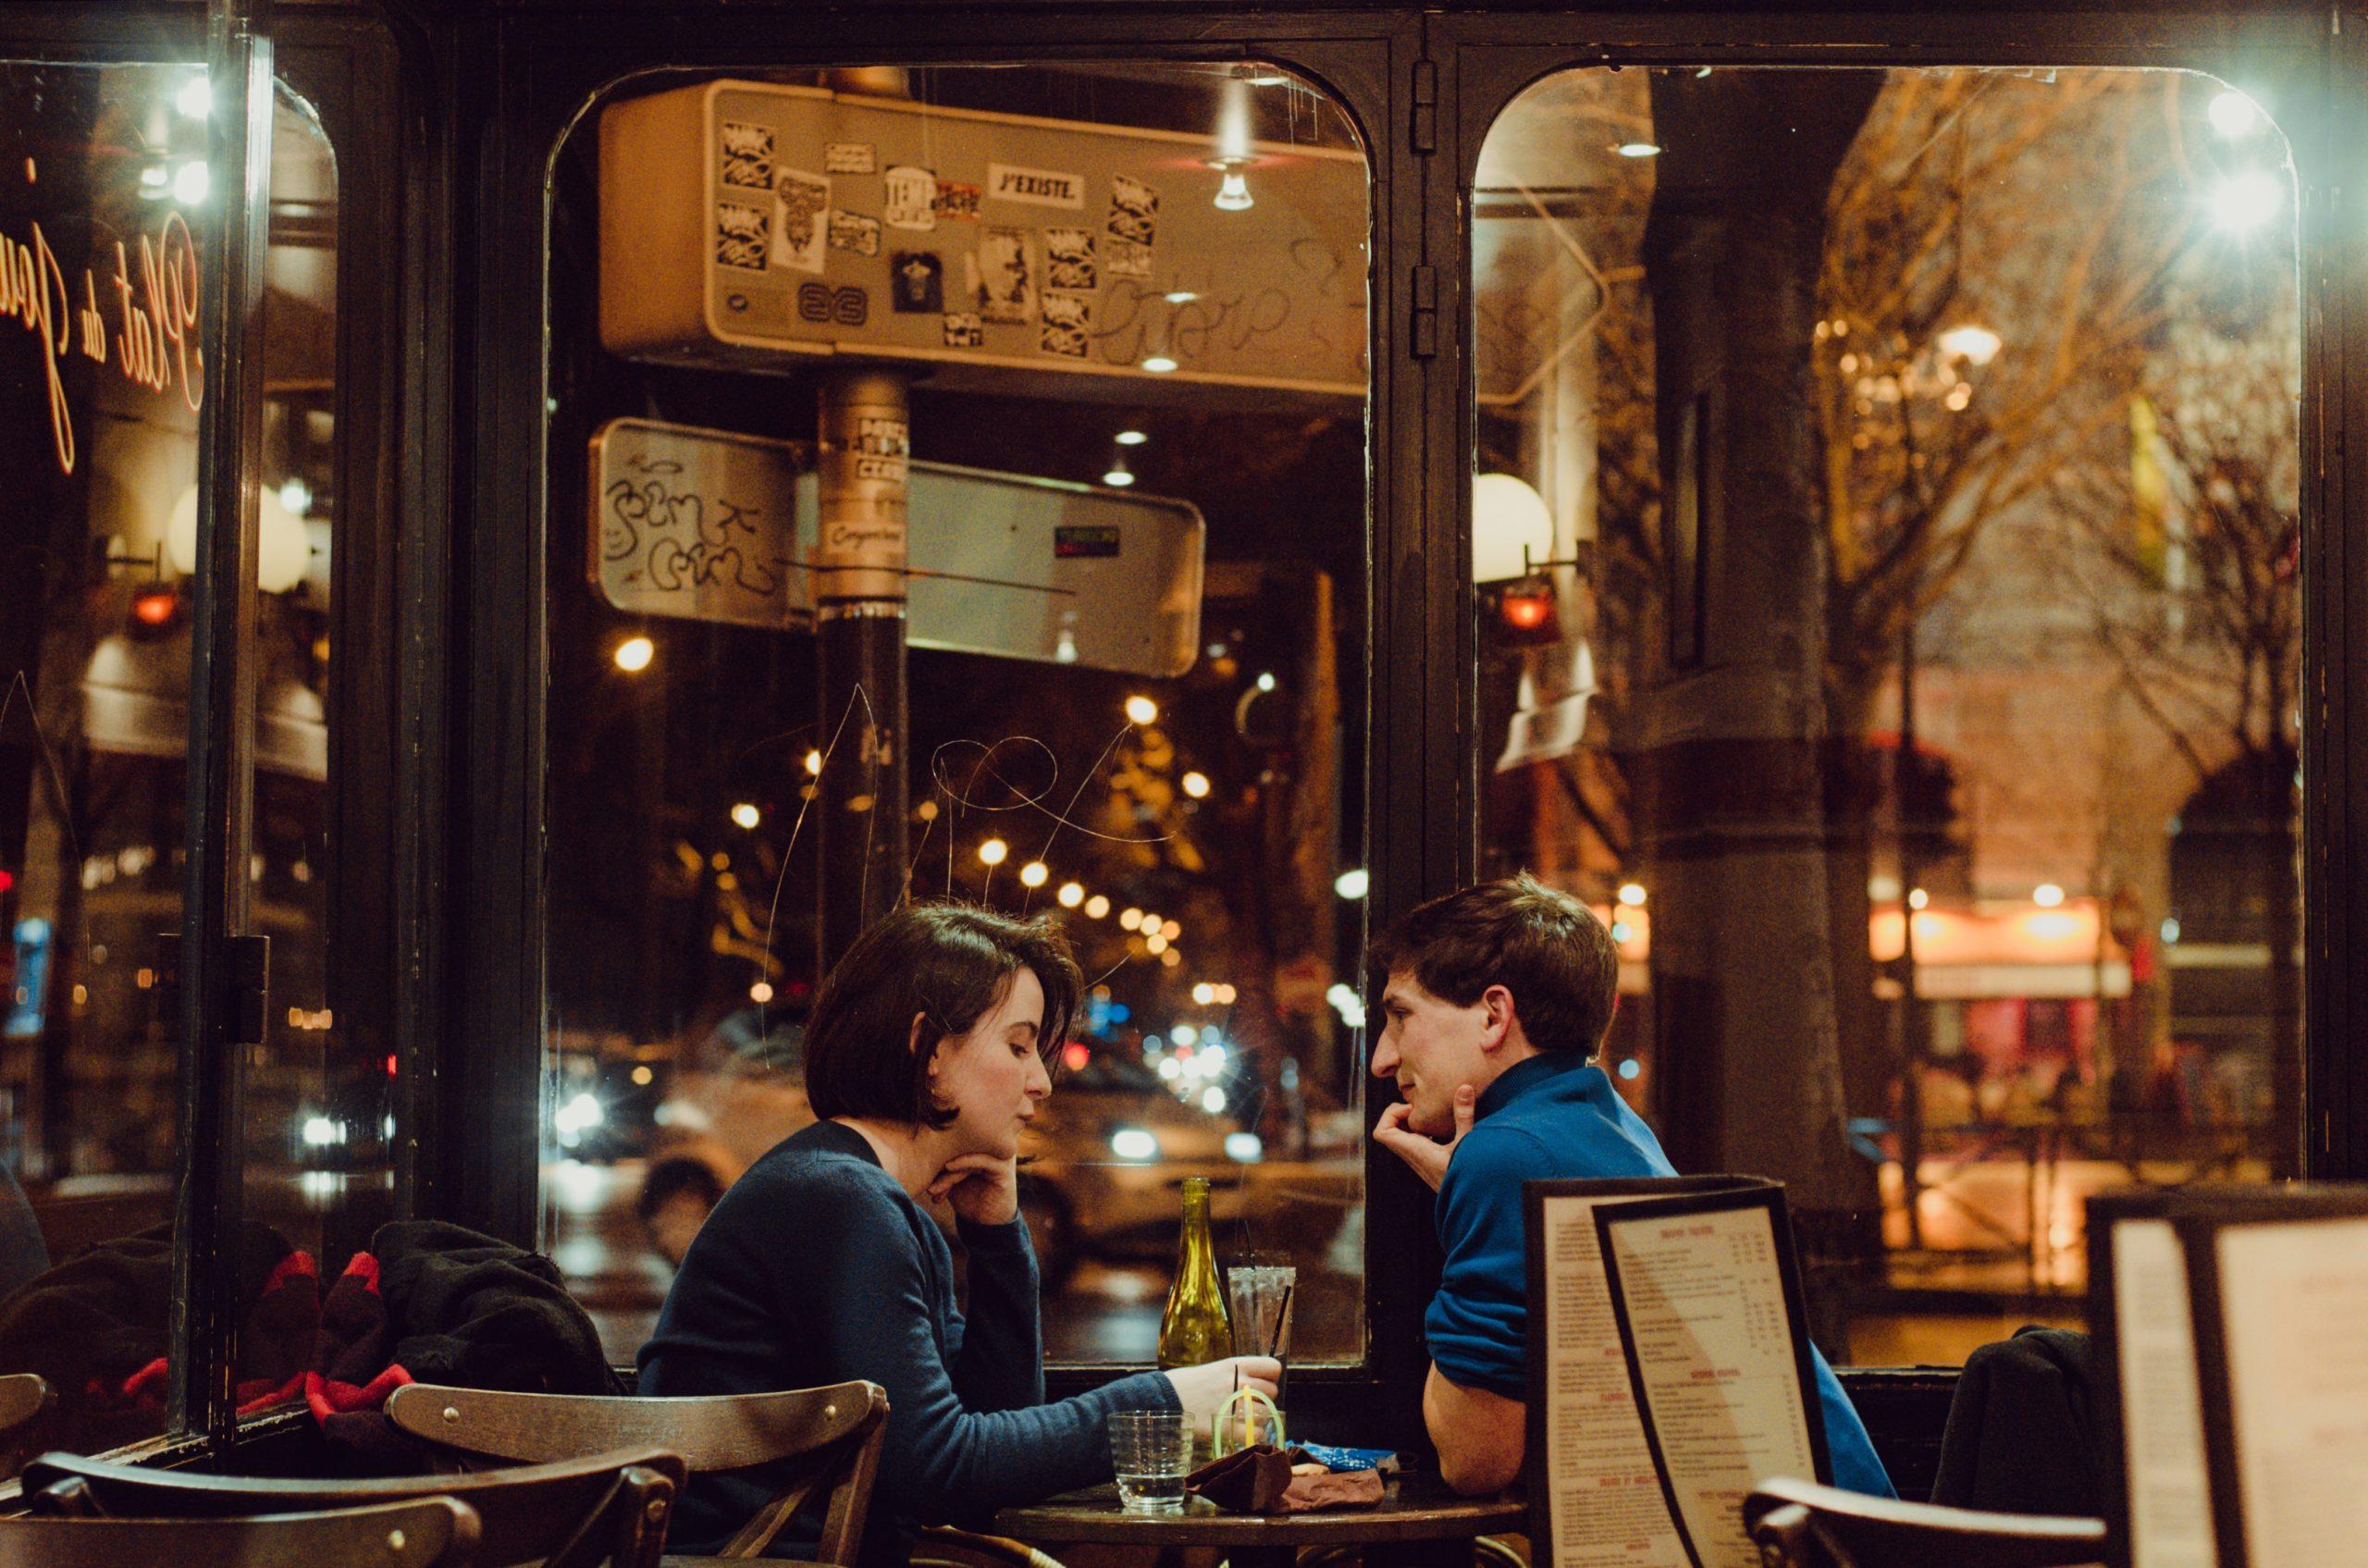 Date Night Conversation Ideas